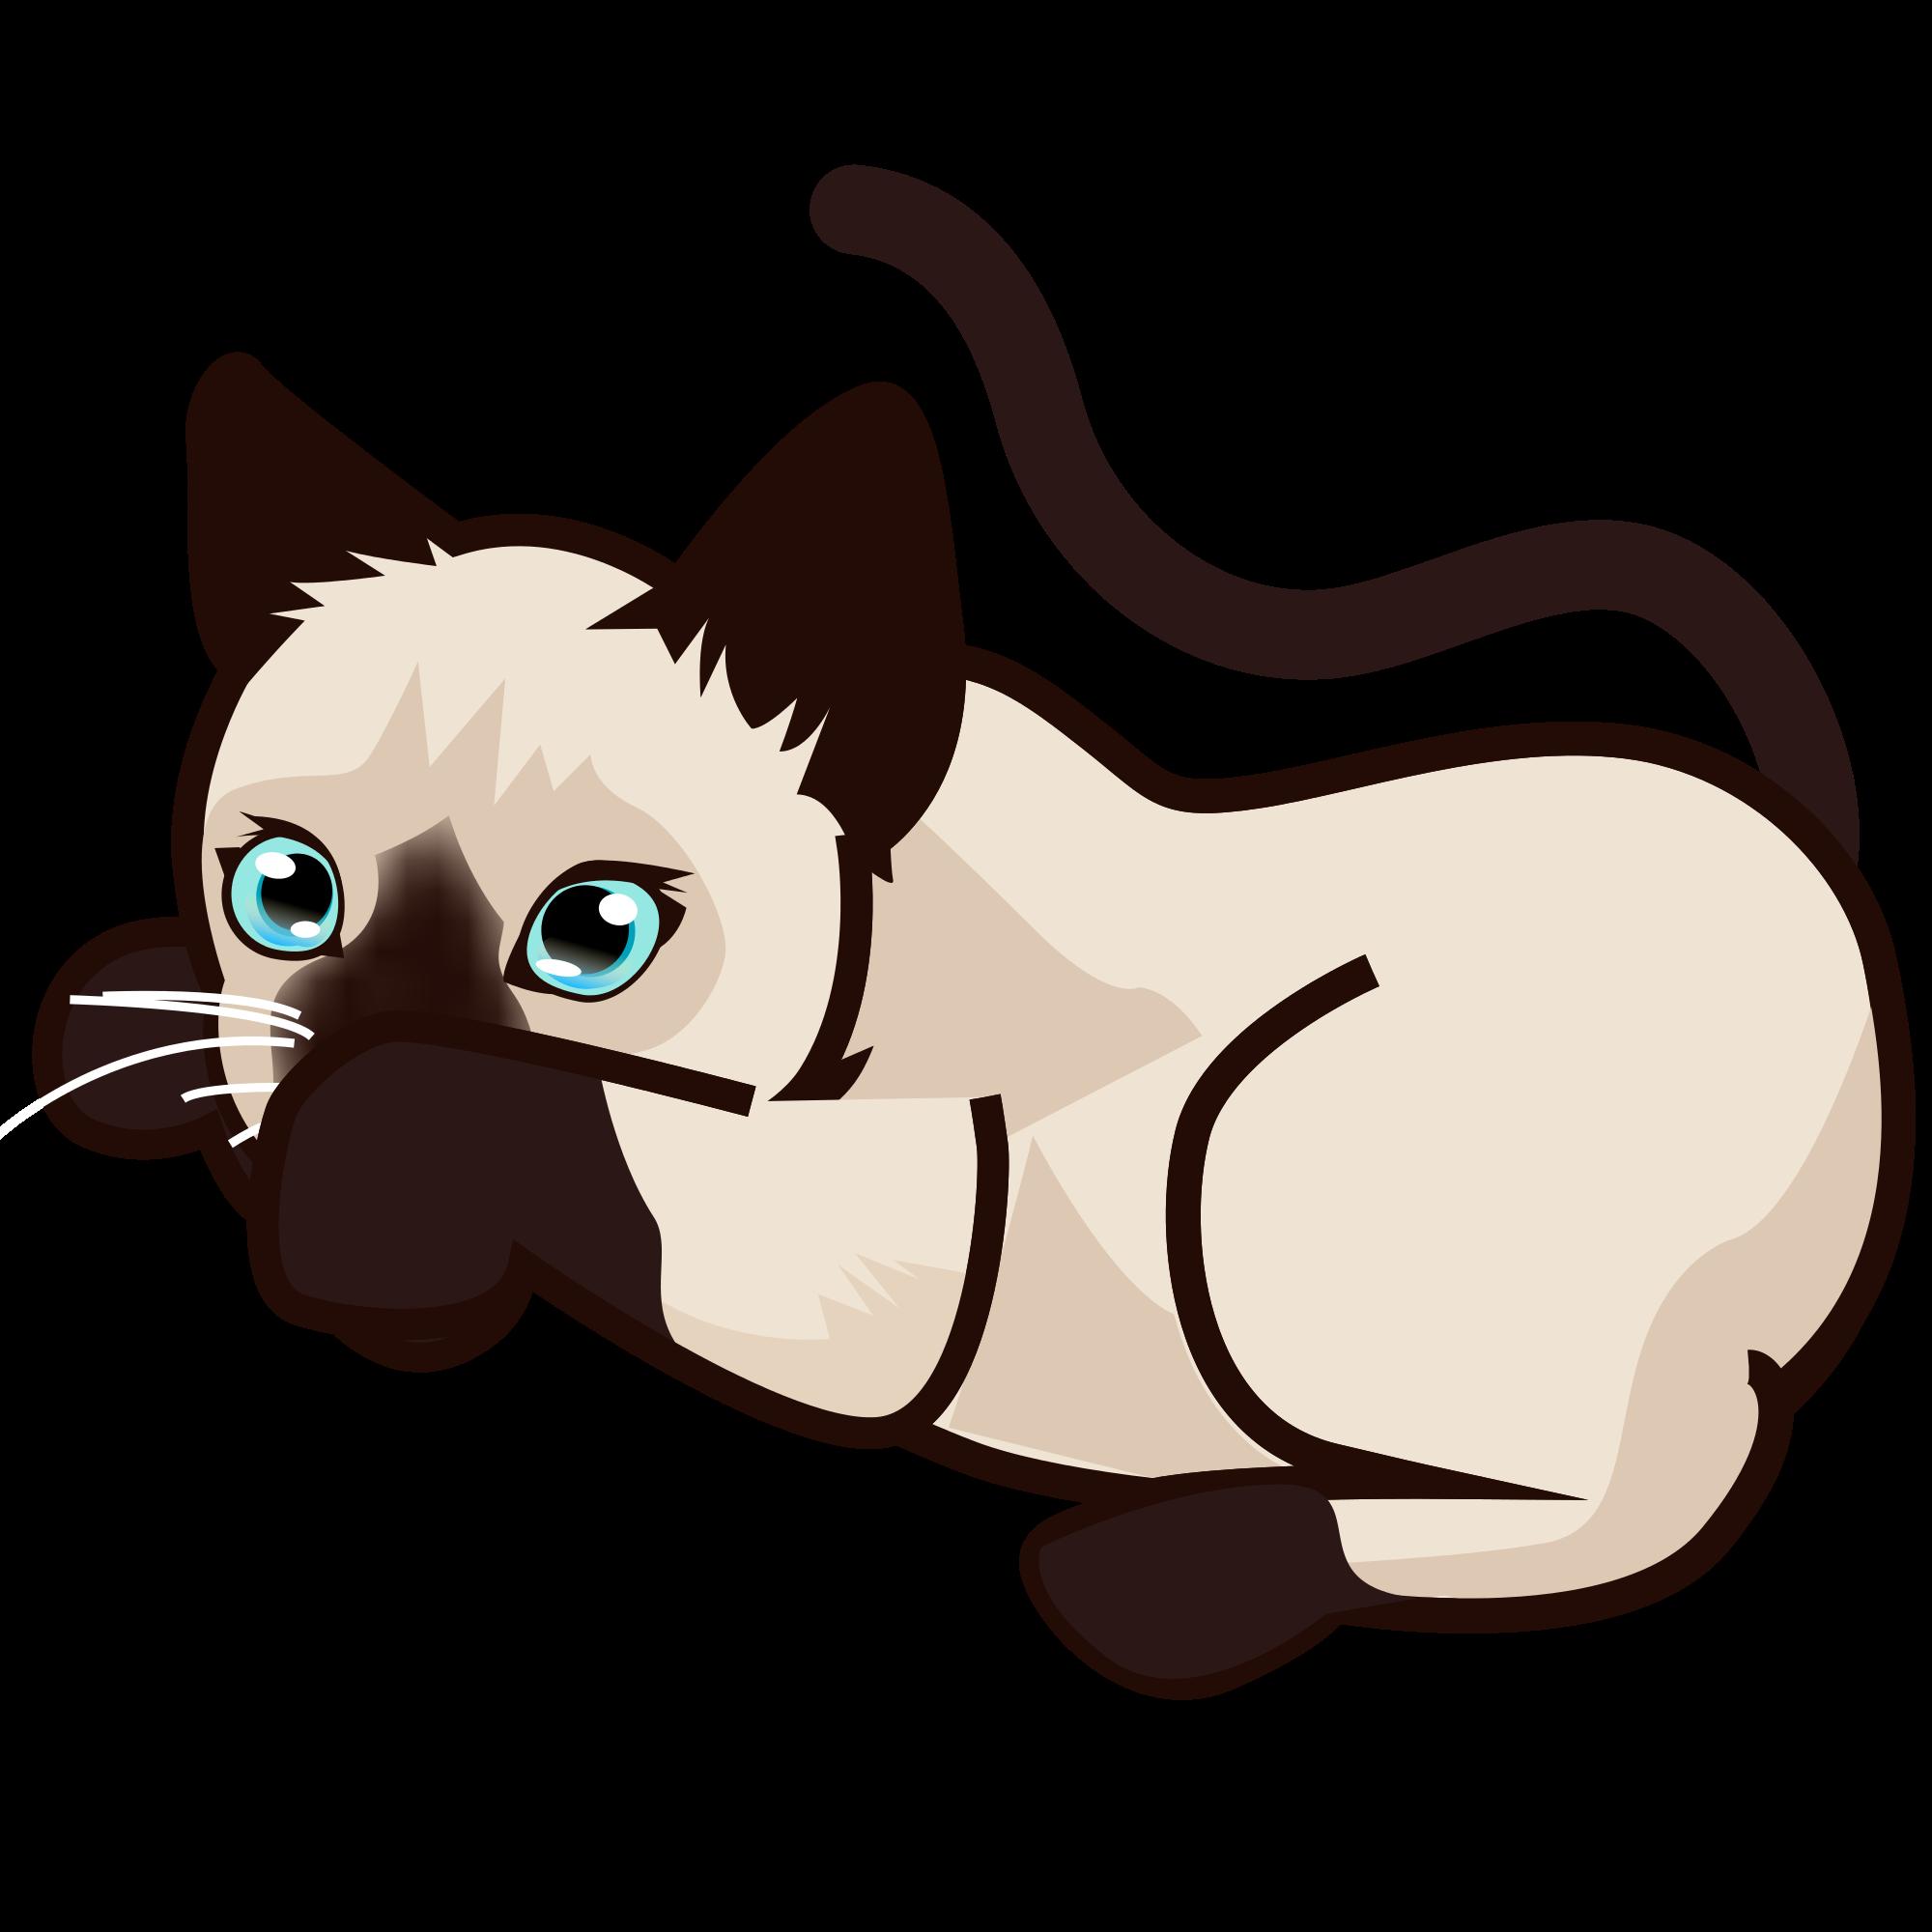 Kitten clipart file. Peo siamese svg wikimedia